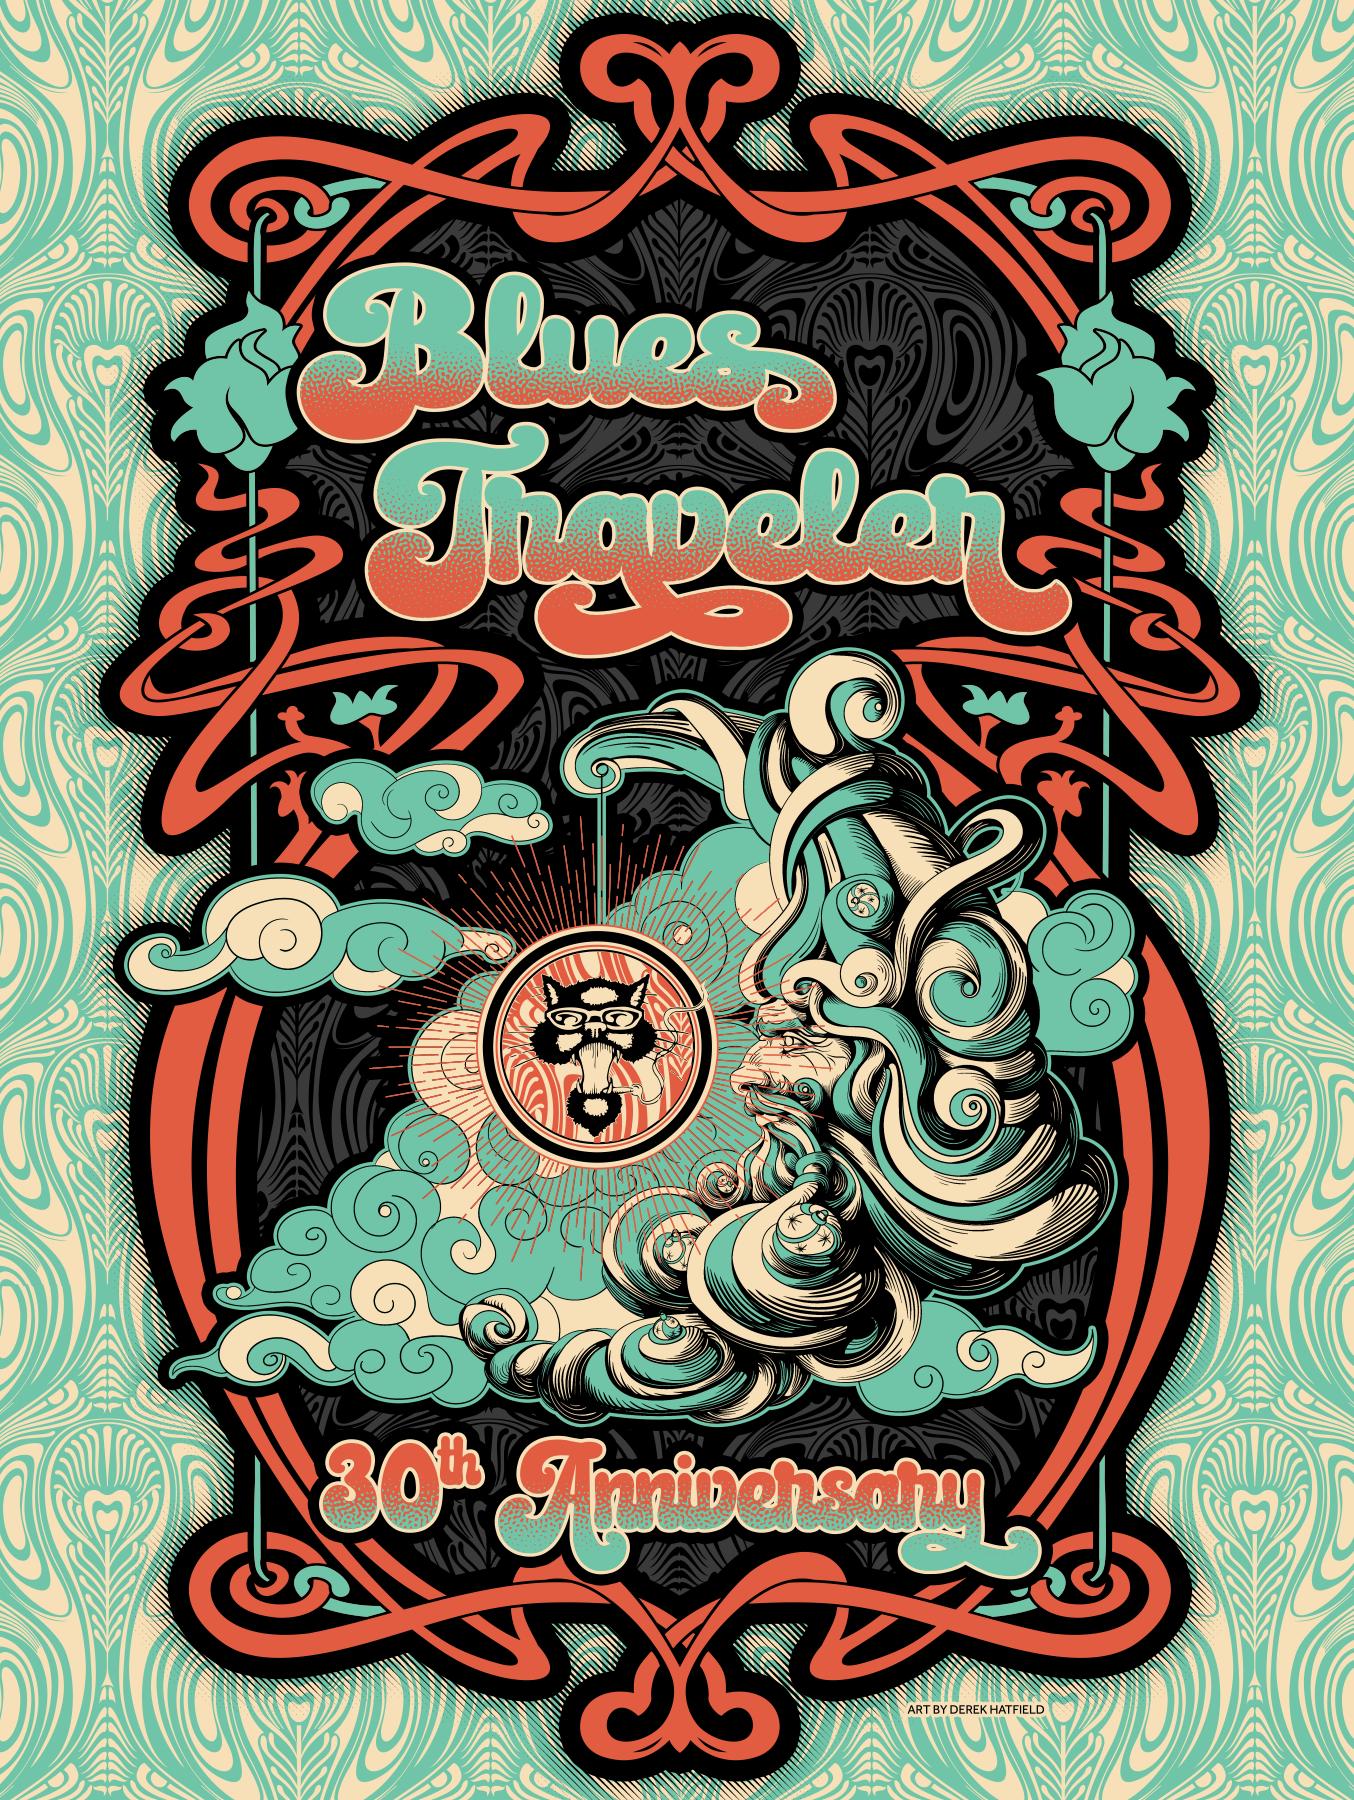 Blues Traveler - 30th Anniversary v2